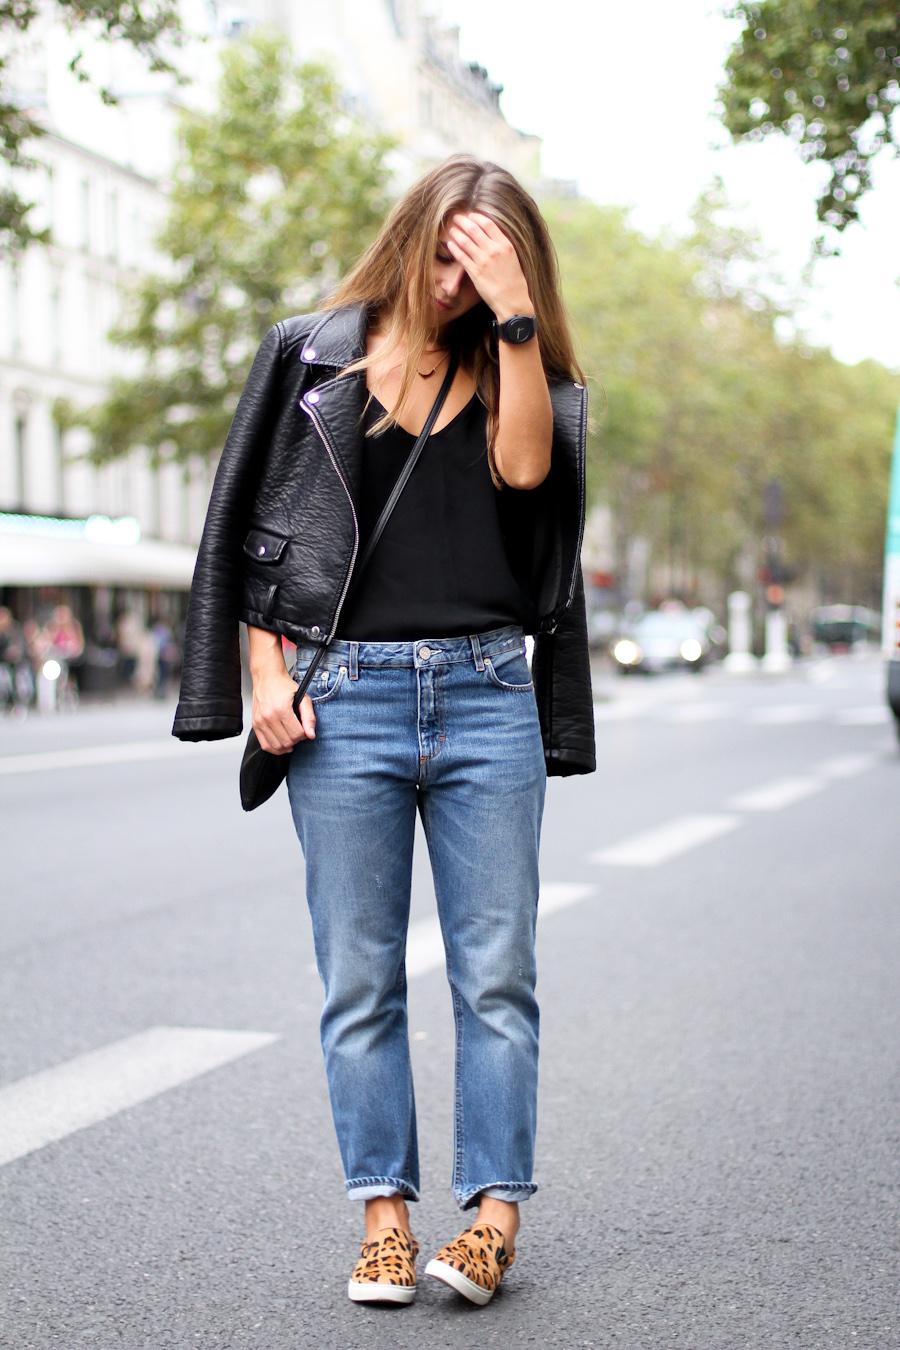 IMG_3299-Clochet Acne Pop Betty Jeans Leopard slippons